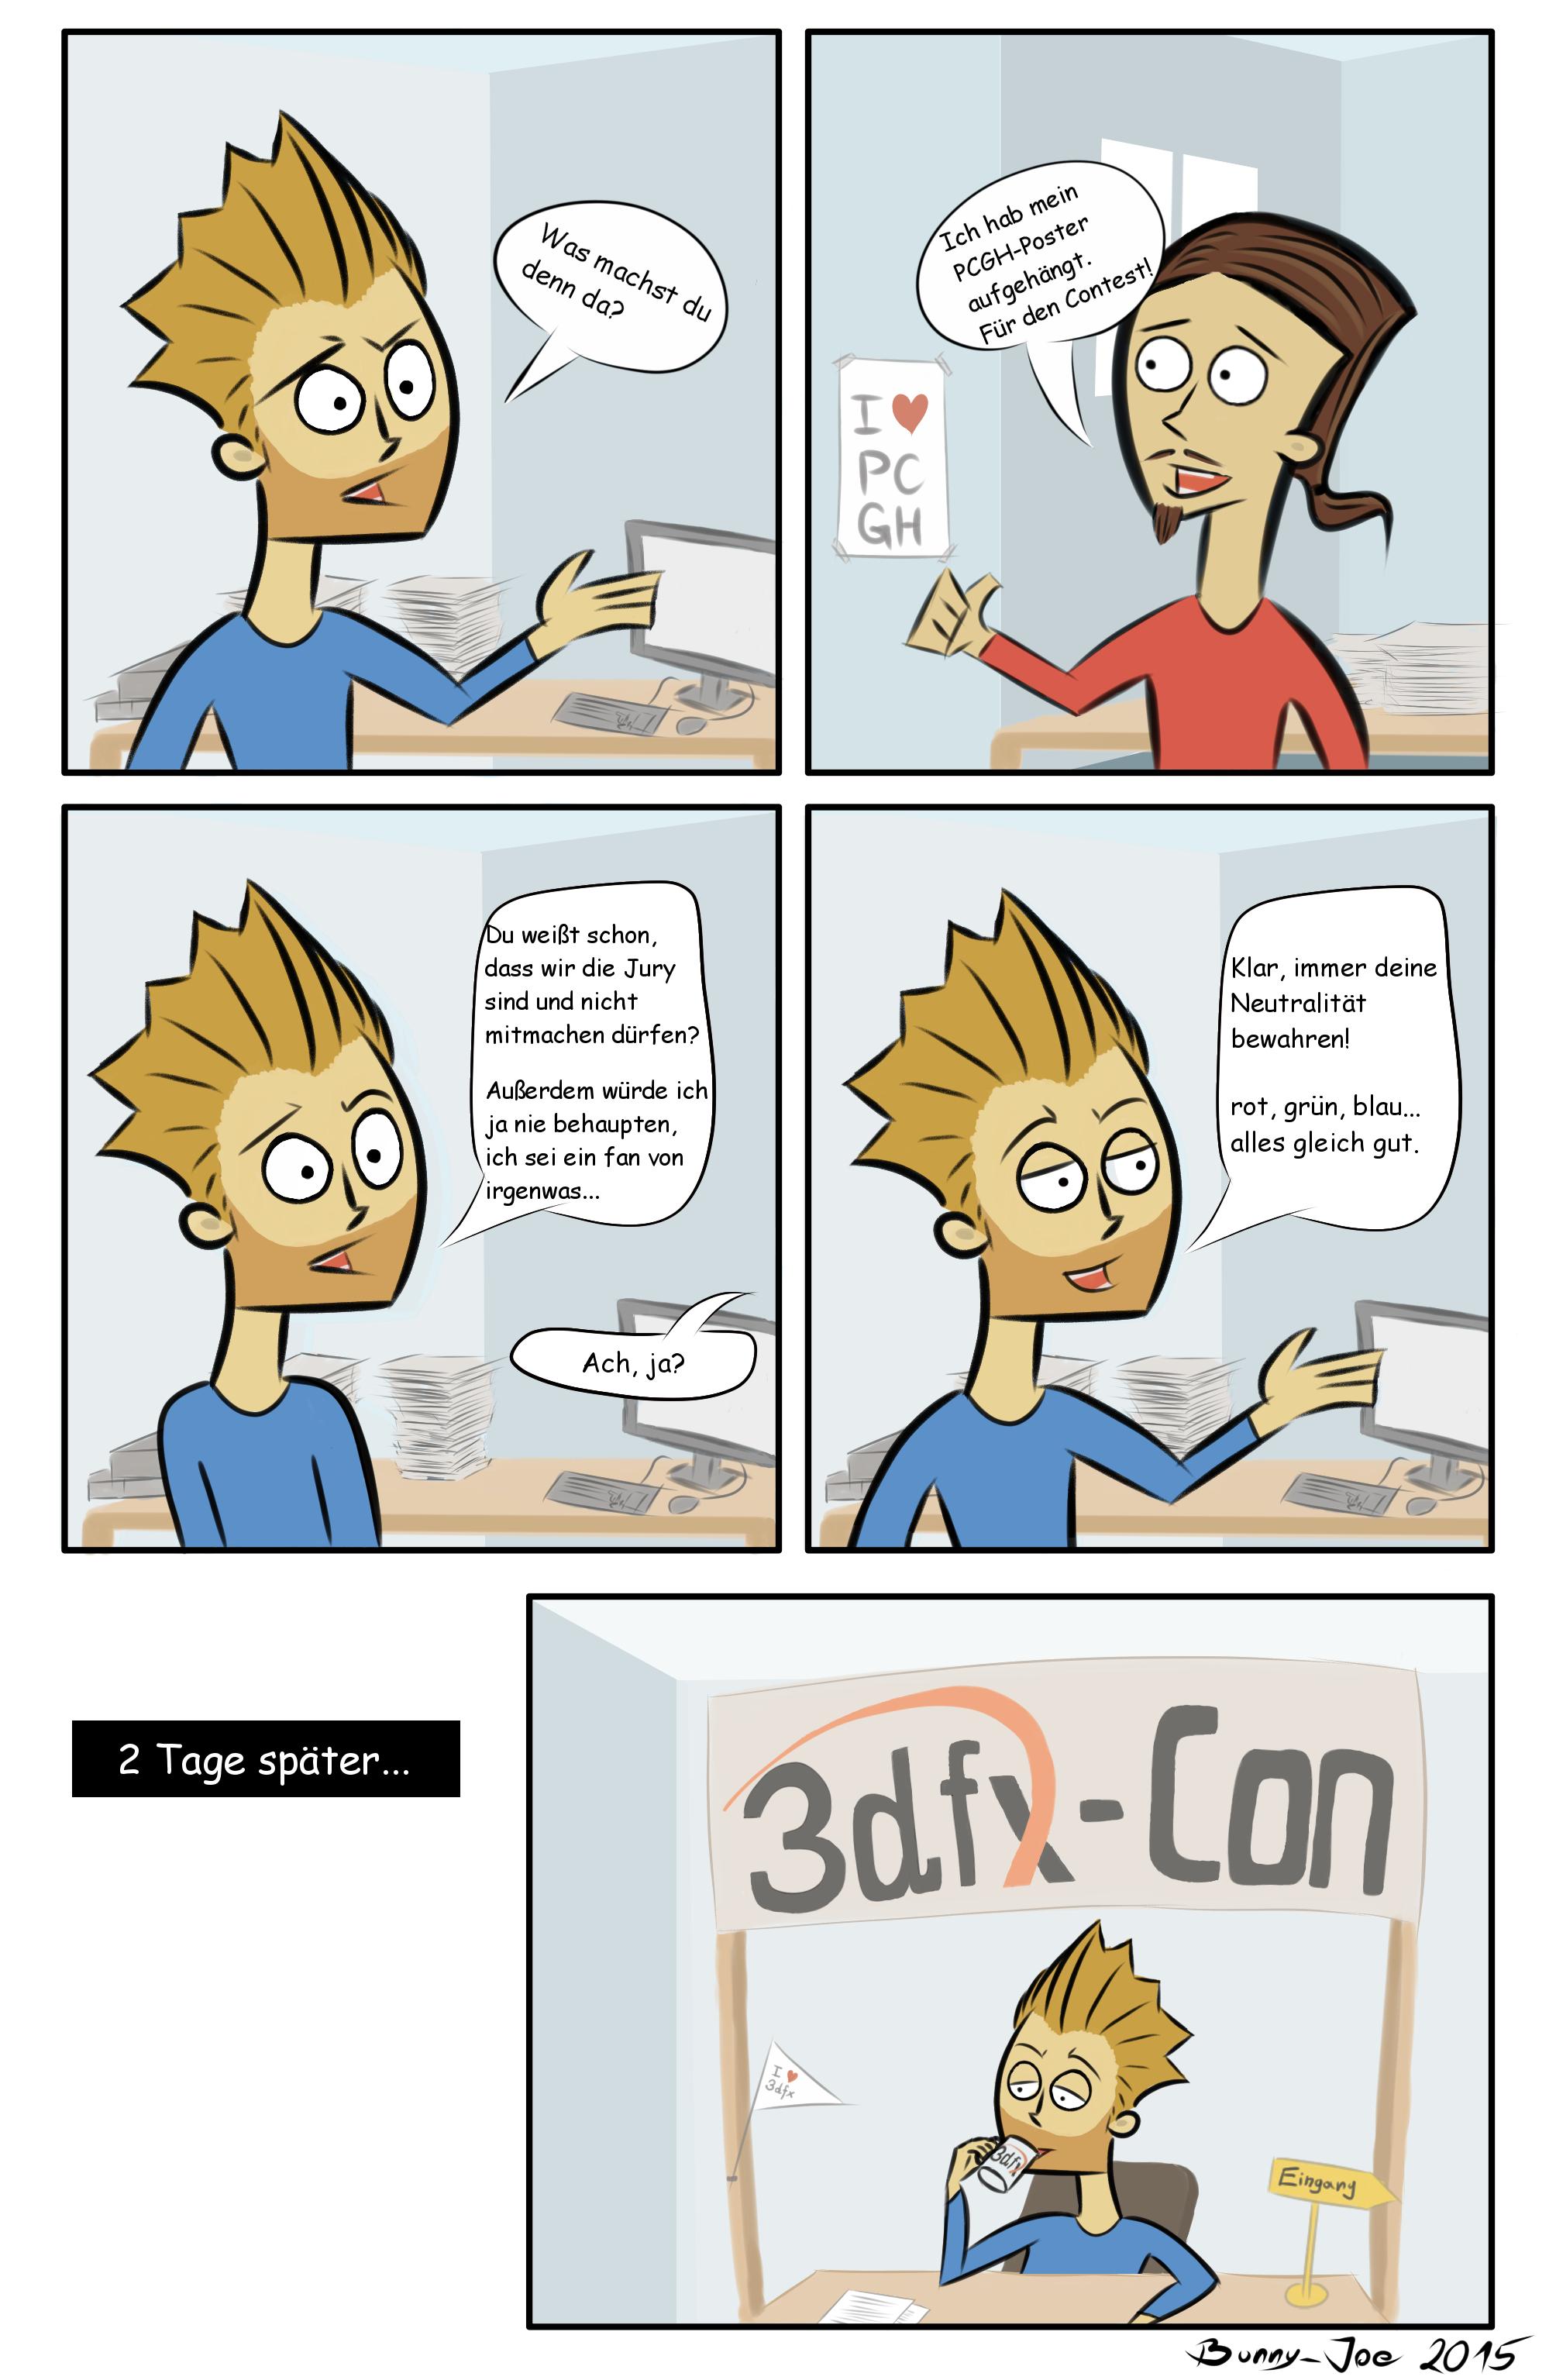 pcgh-comic-jpg.857505